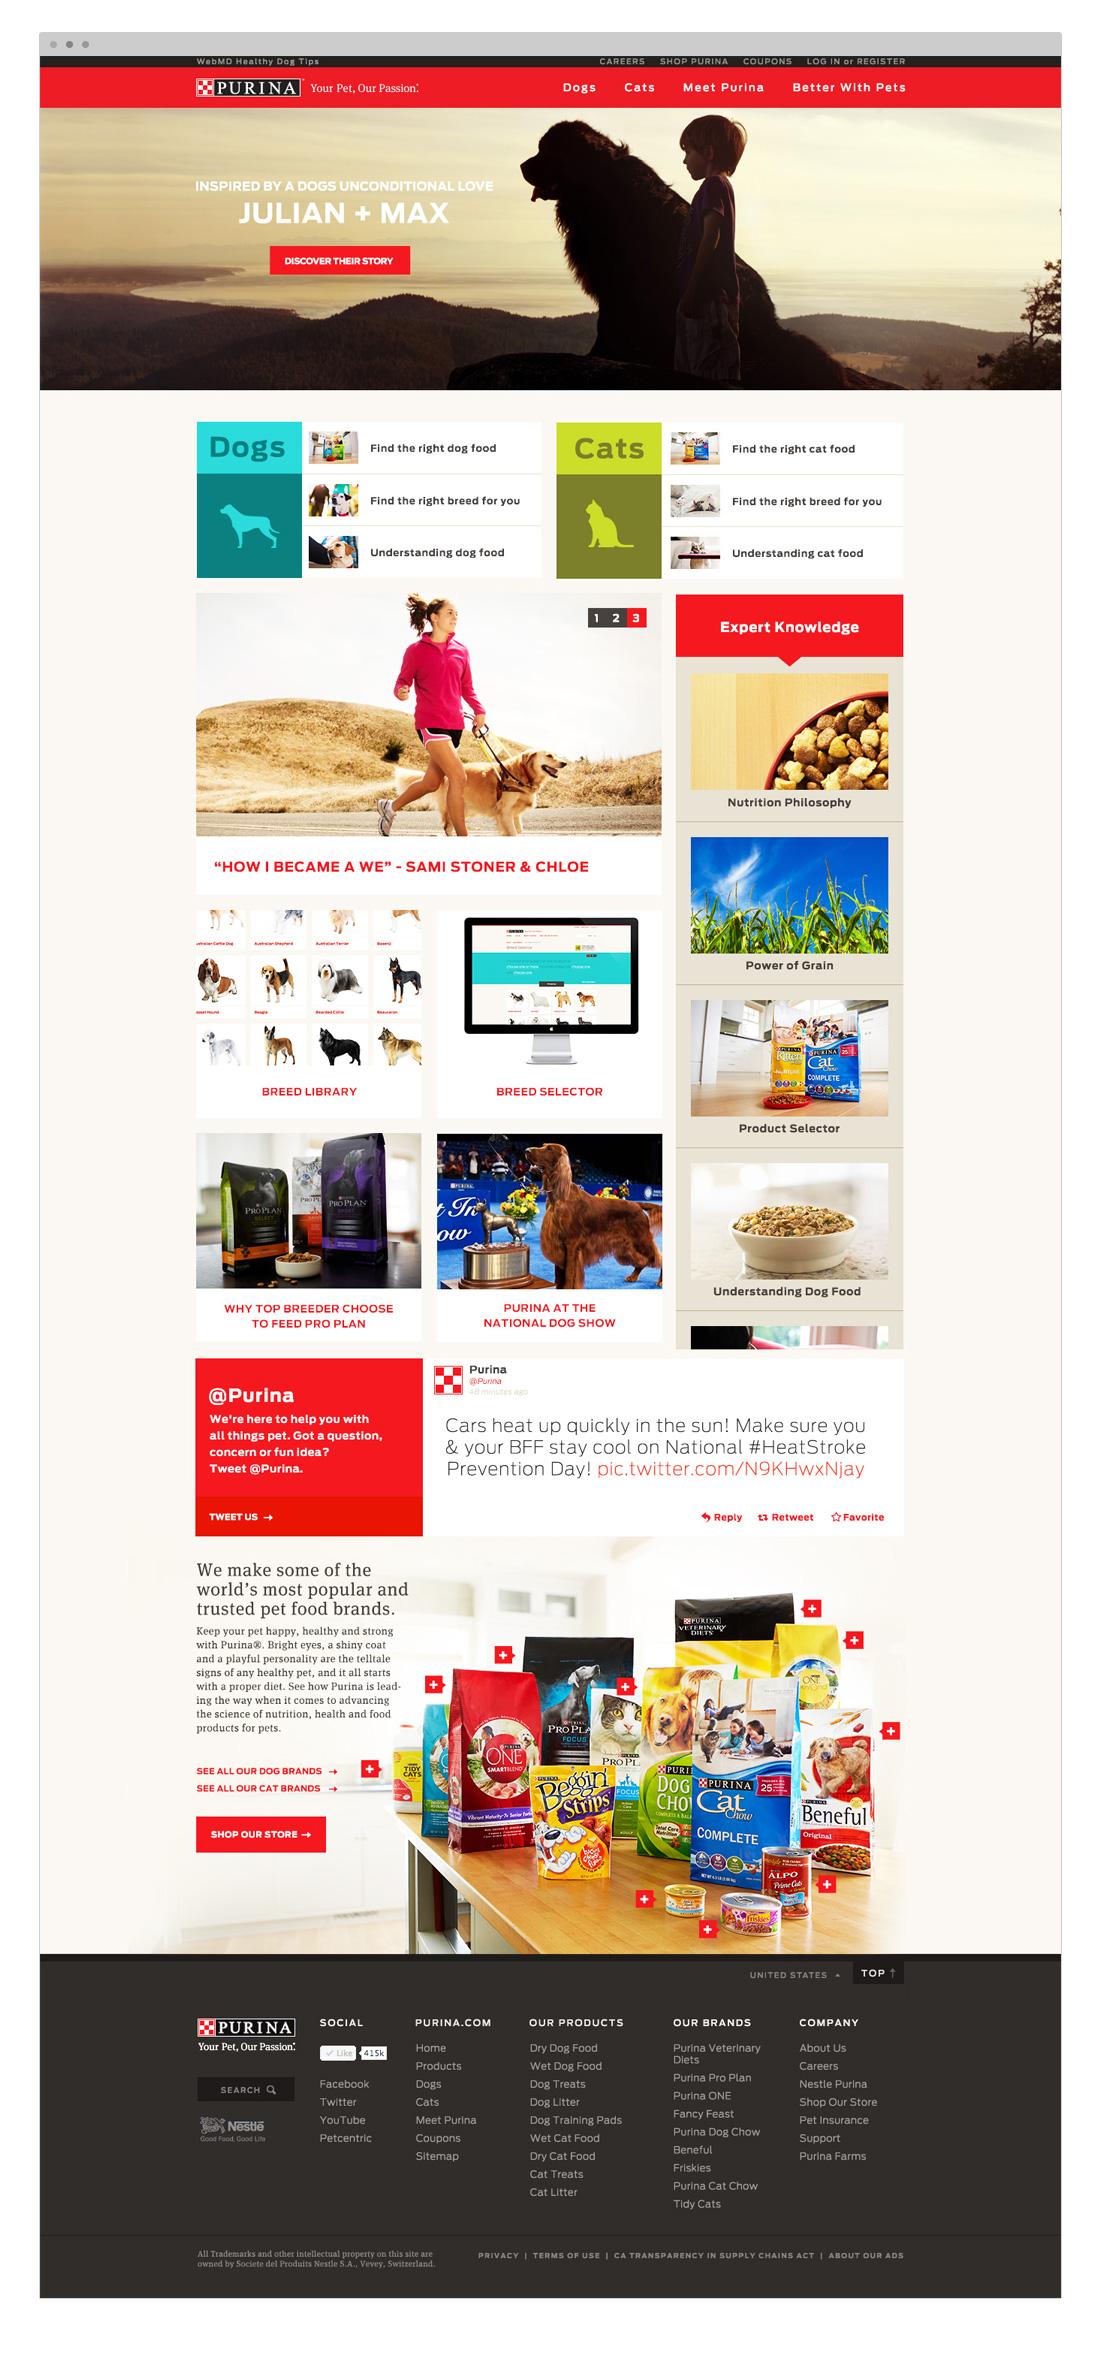 BenOlsem_Purina_Homepage